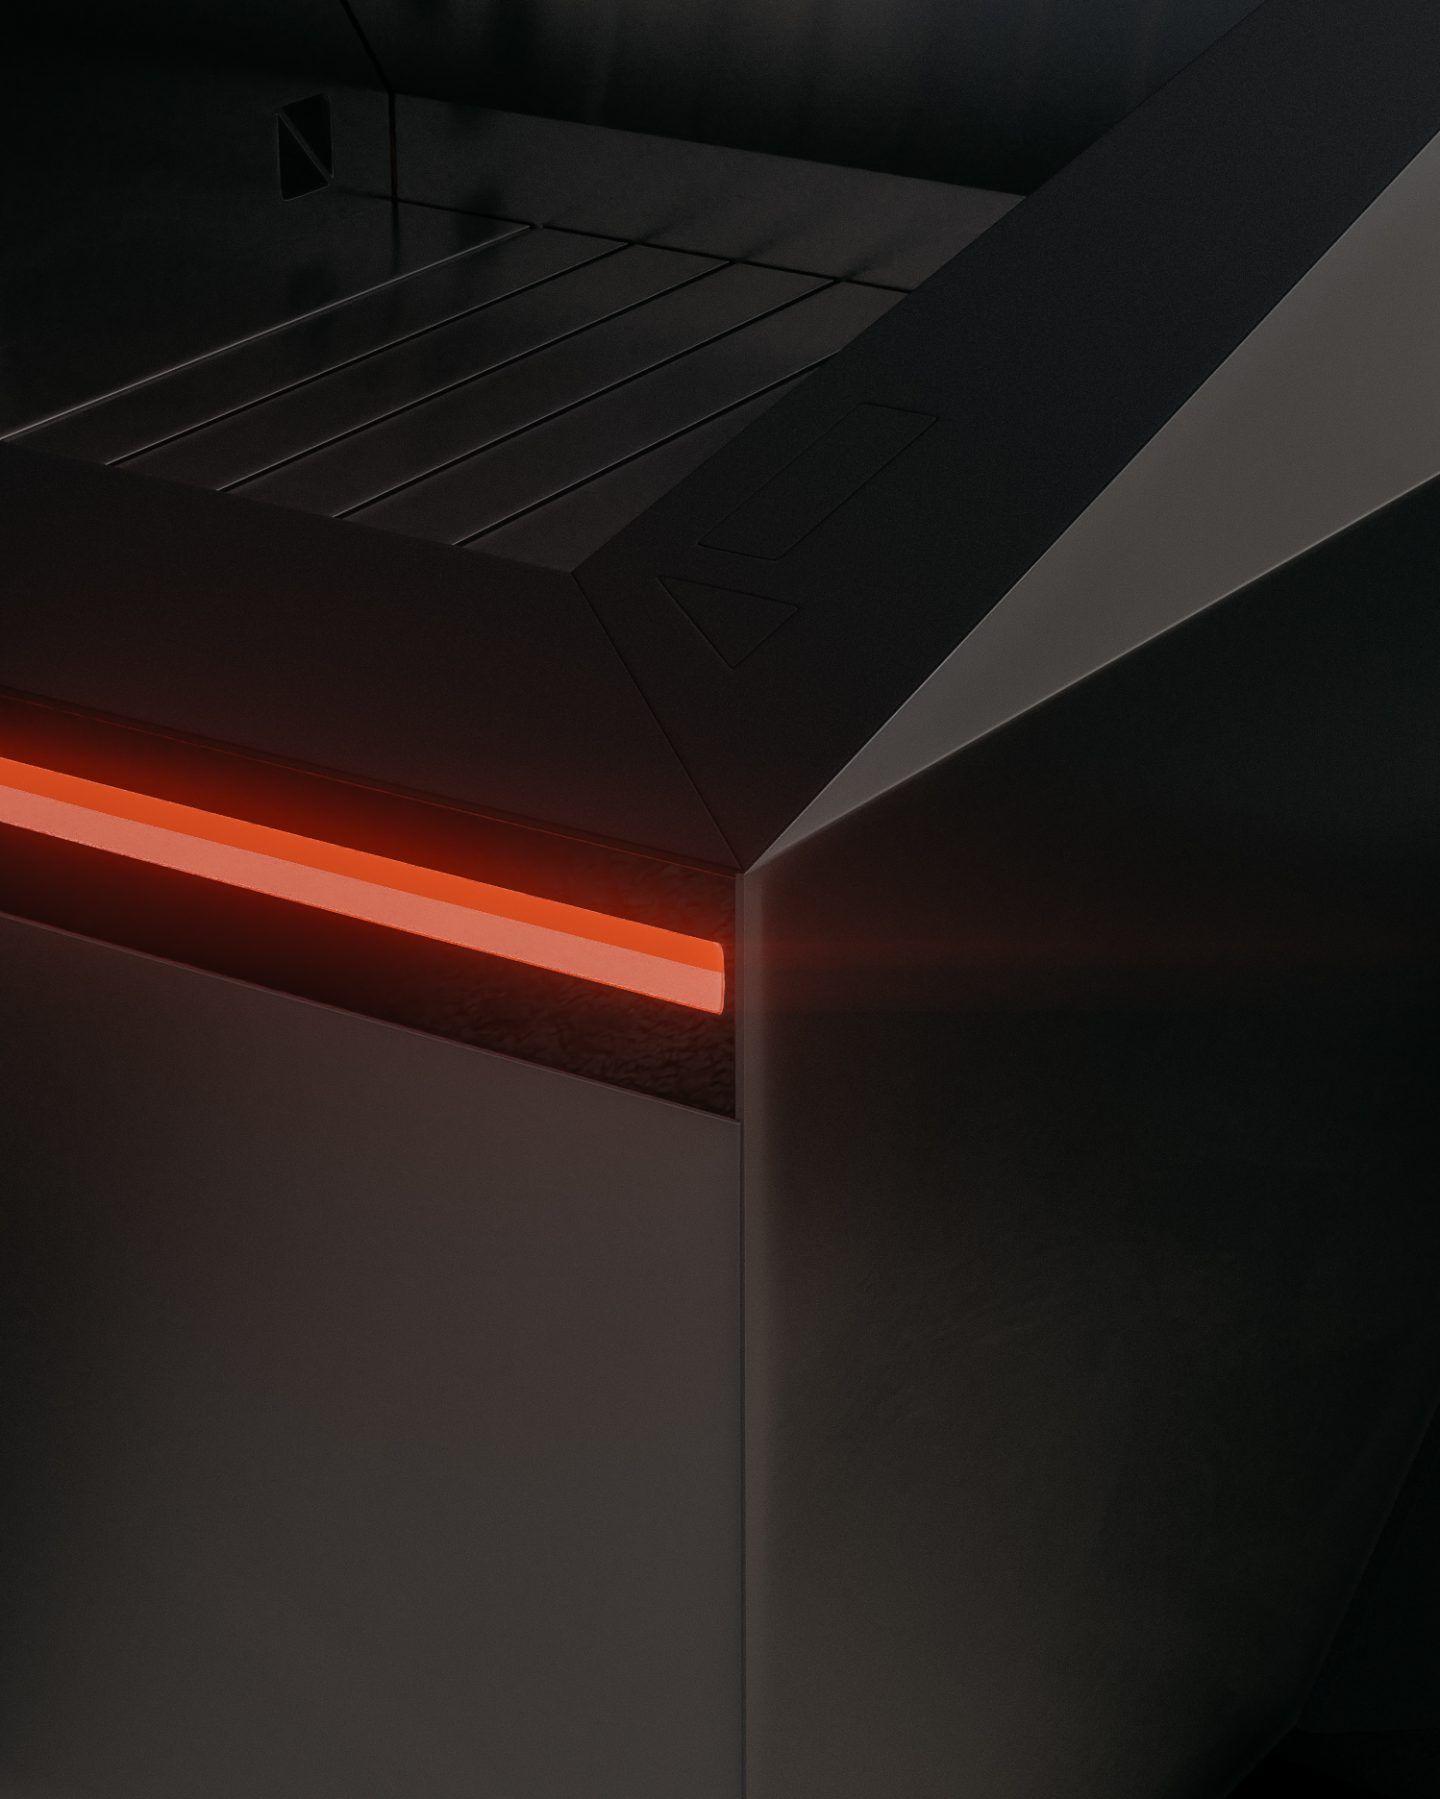 IGNANT-Tesla-cybertruck-cgi-brutalism-cgi-editorial-11